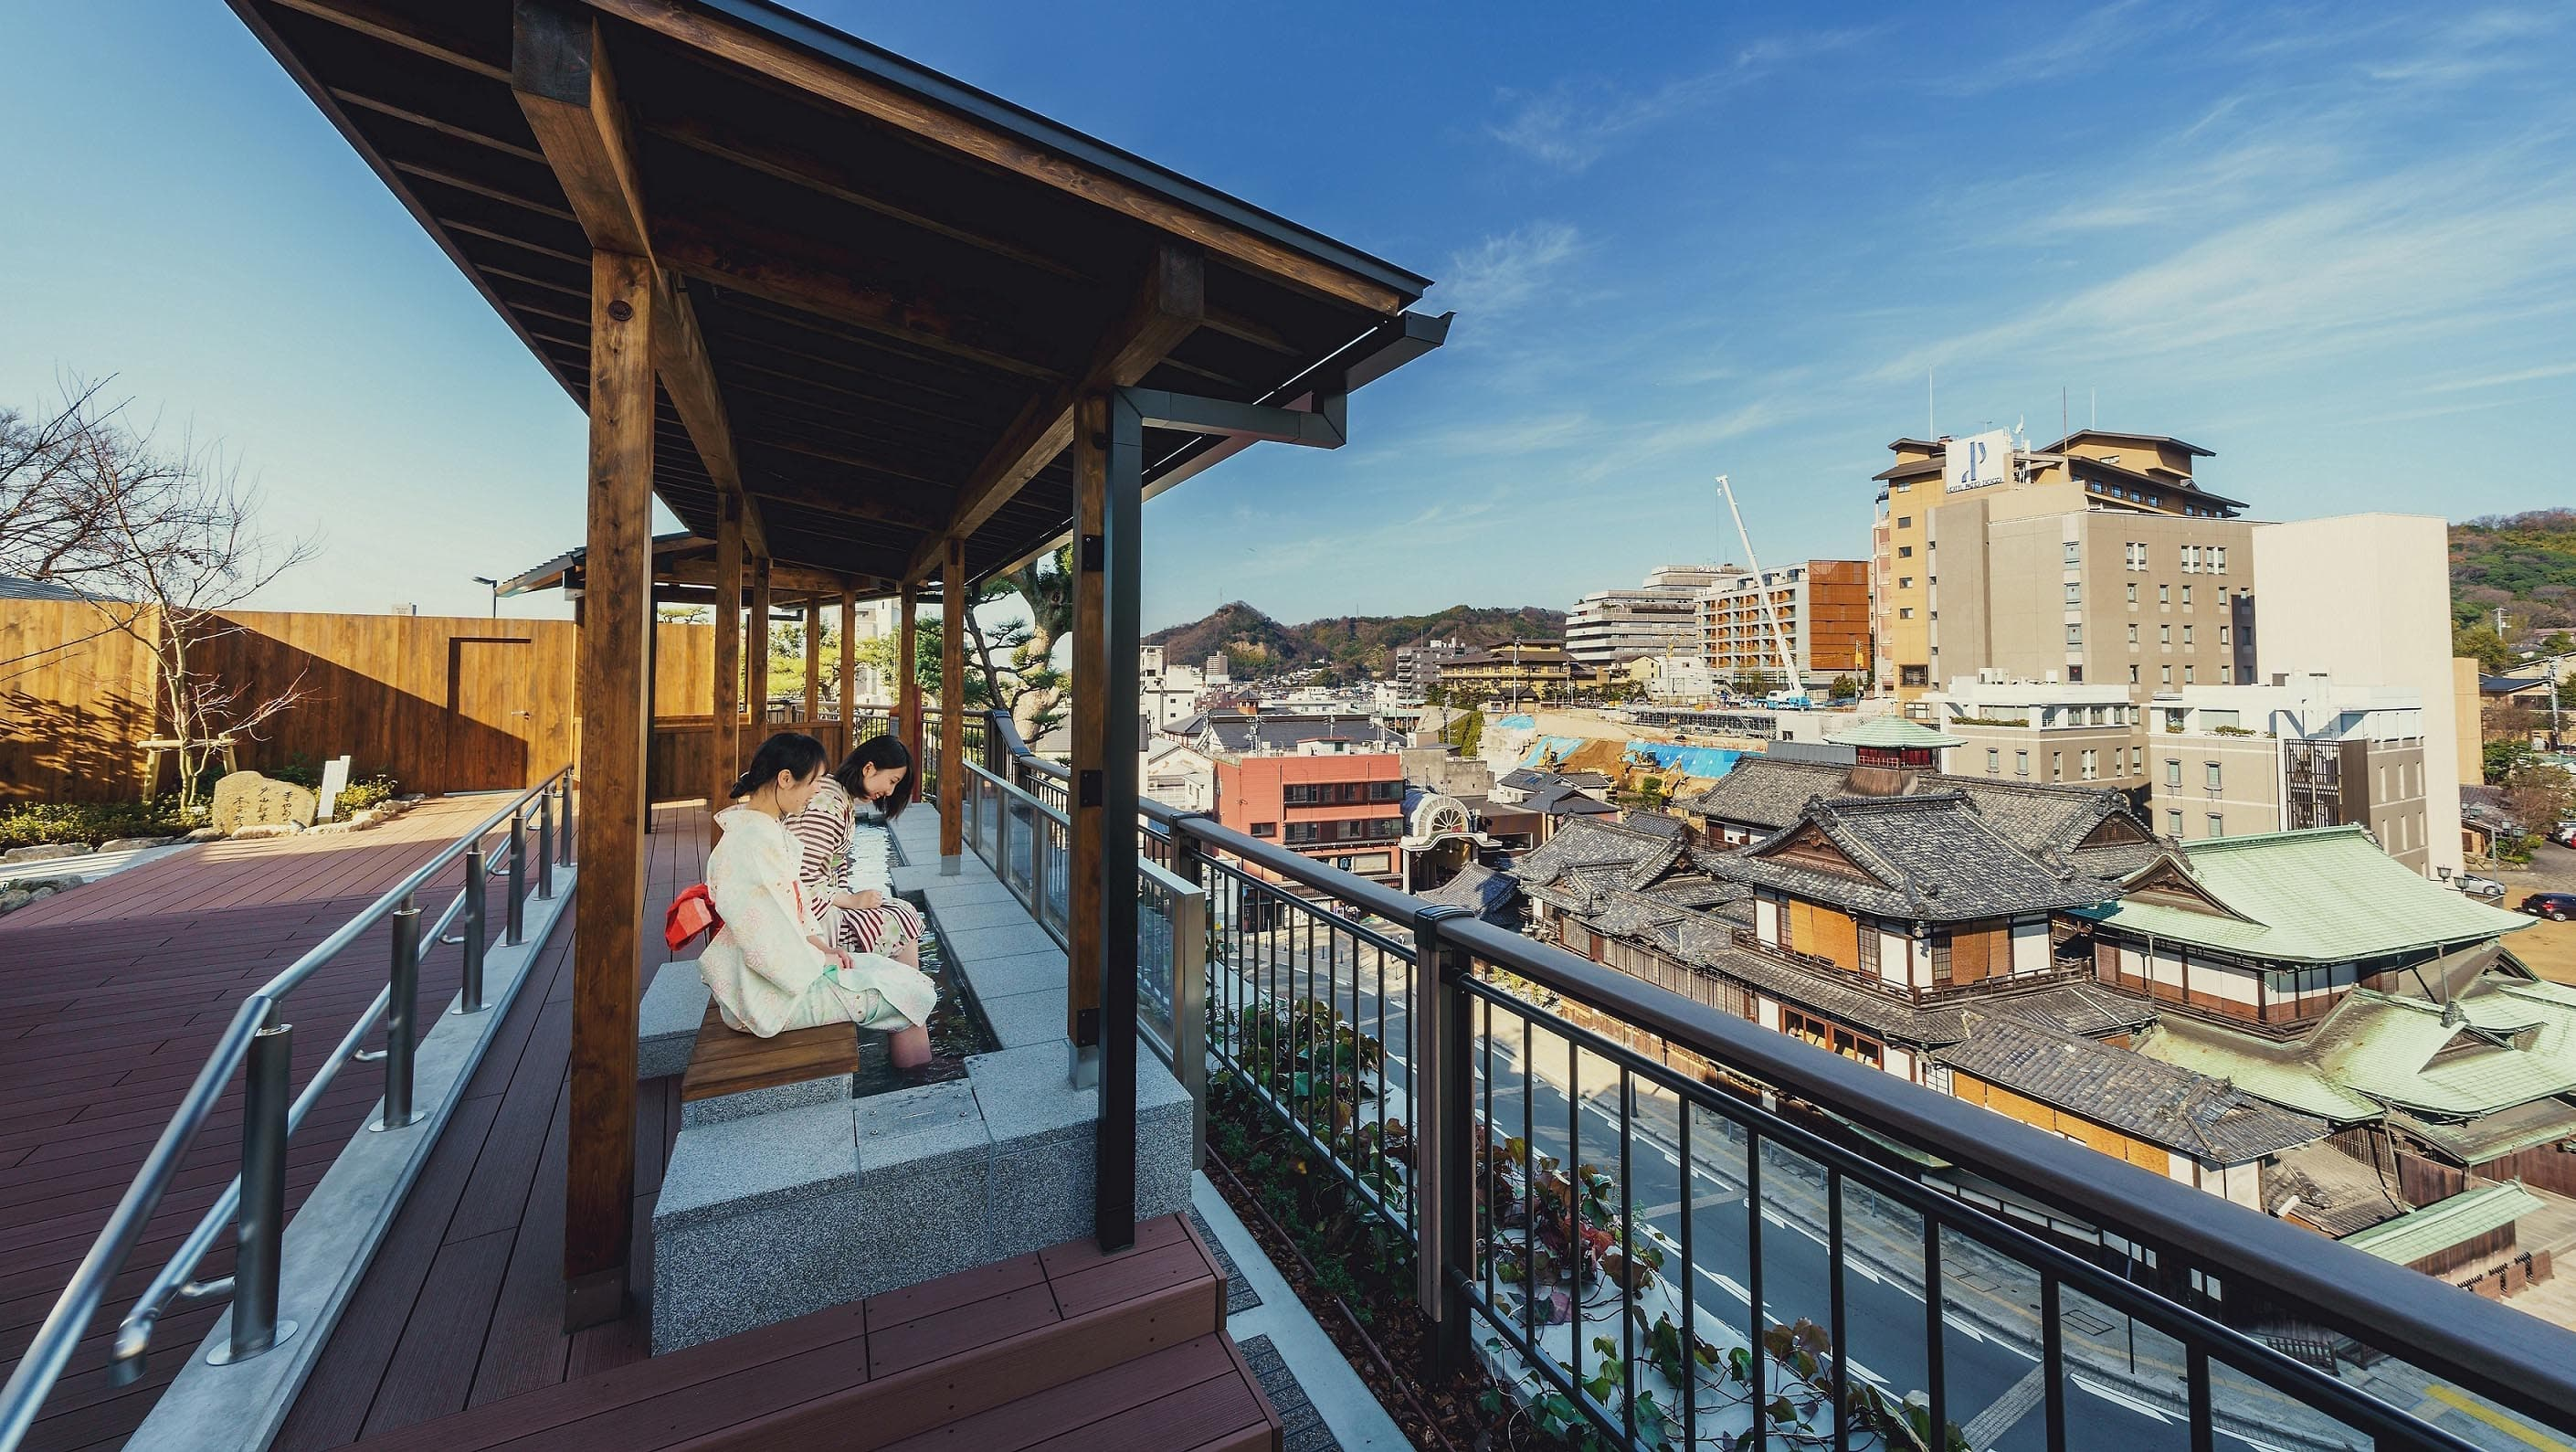 Sora-no-Sanpomichi (sky promenade & footbath)